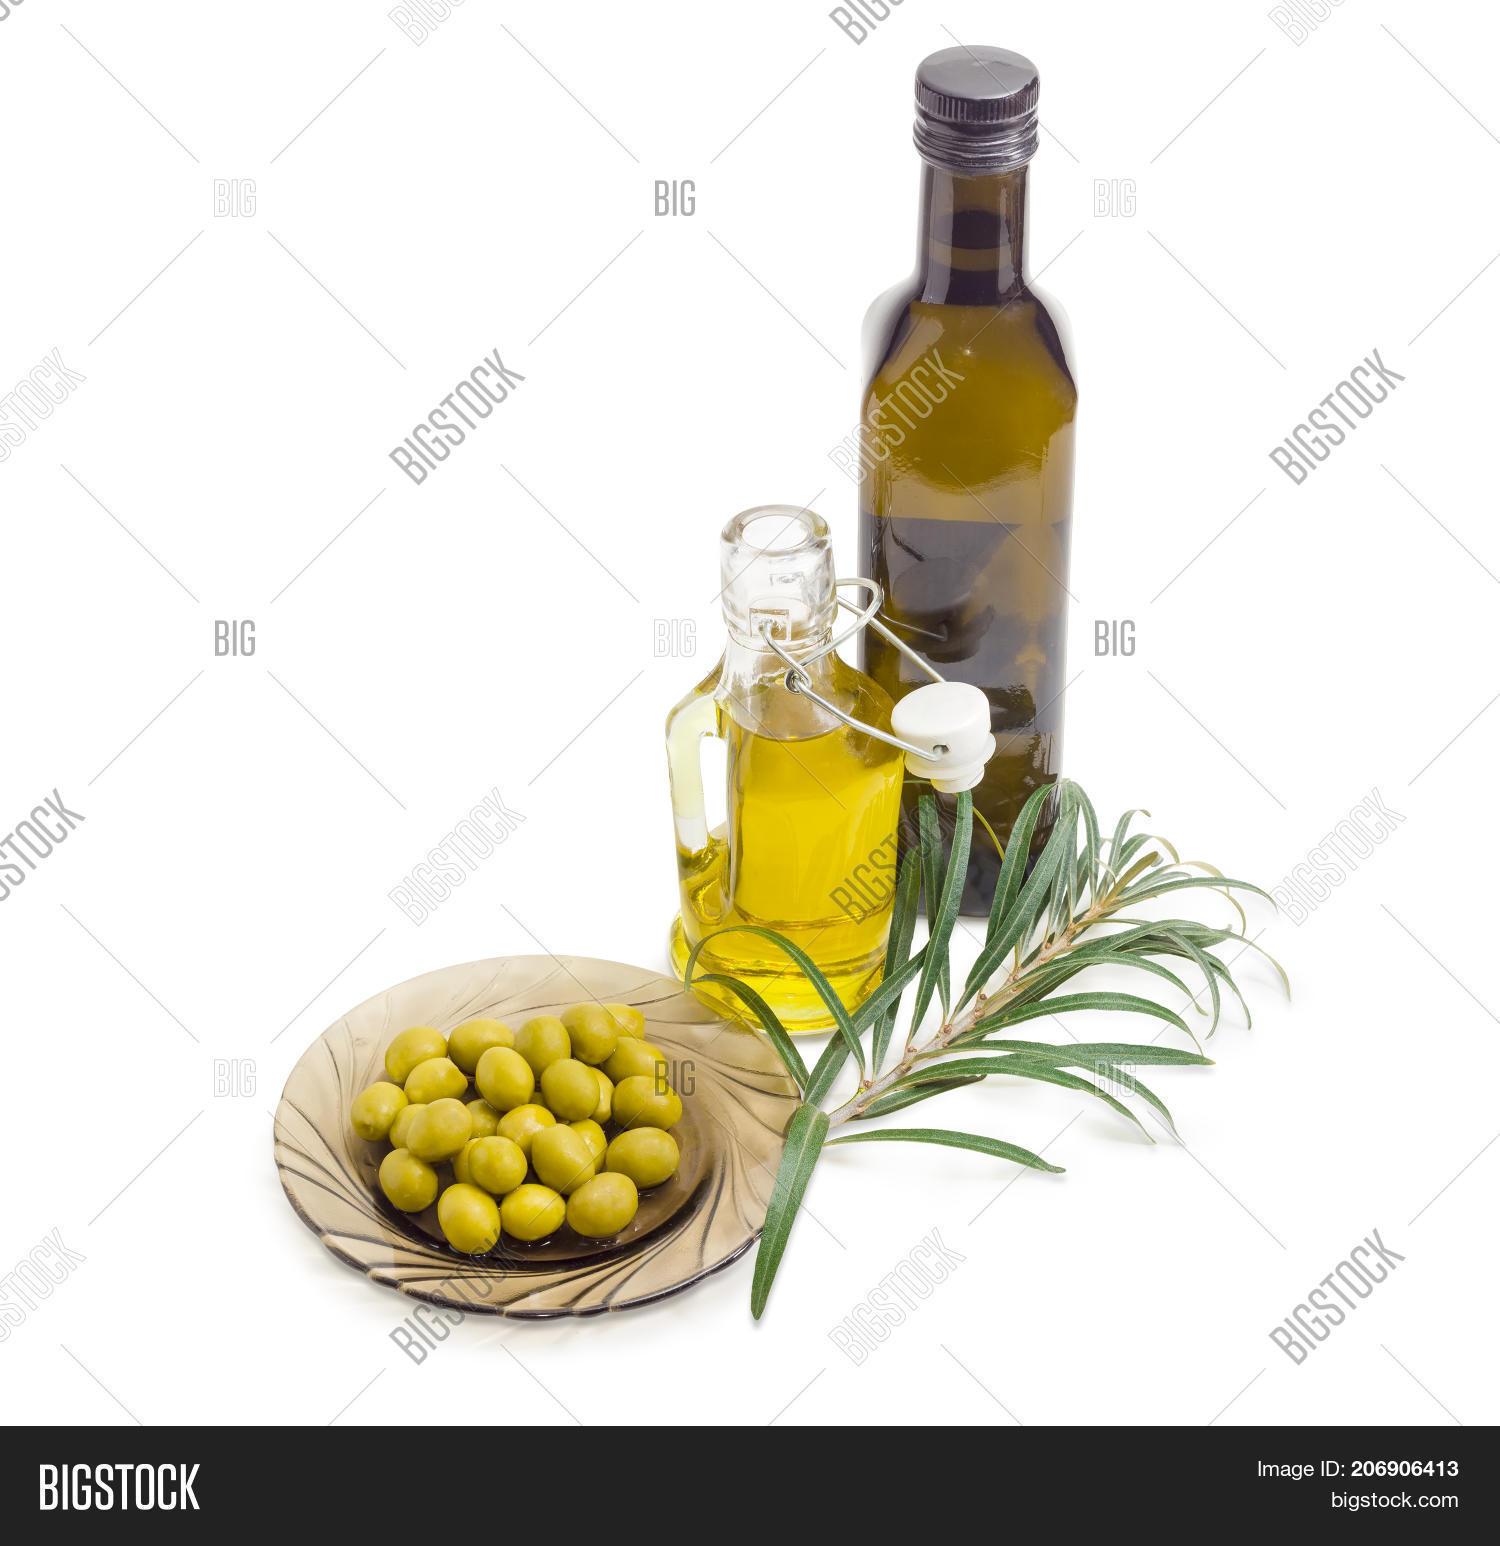 Green Olives On Dark Image & Photo (Free Trial) | Bigstock